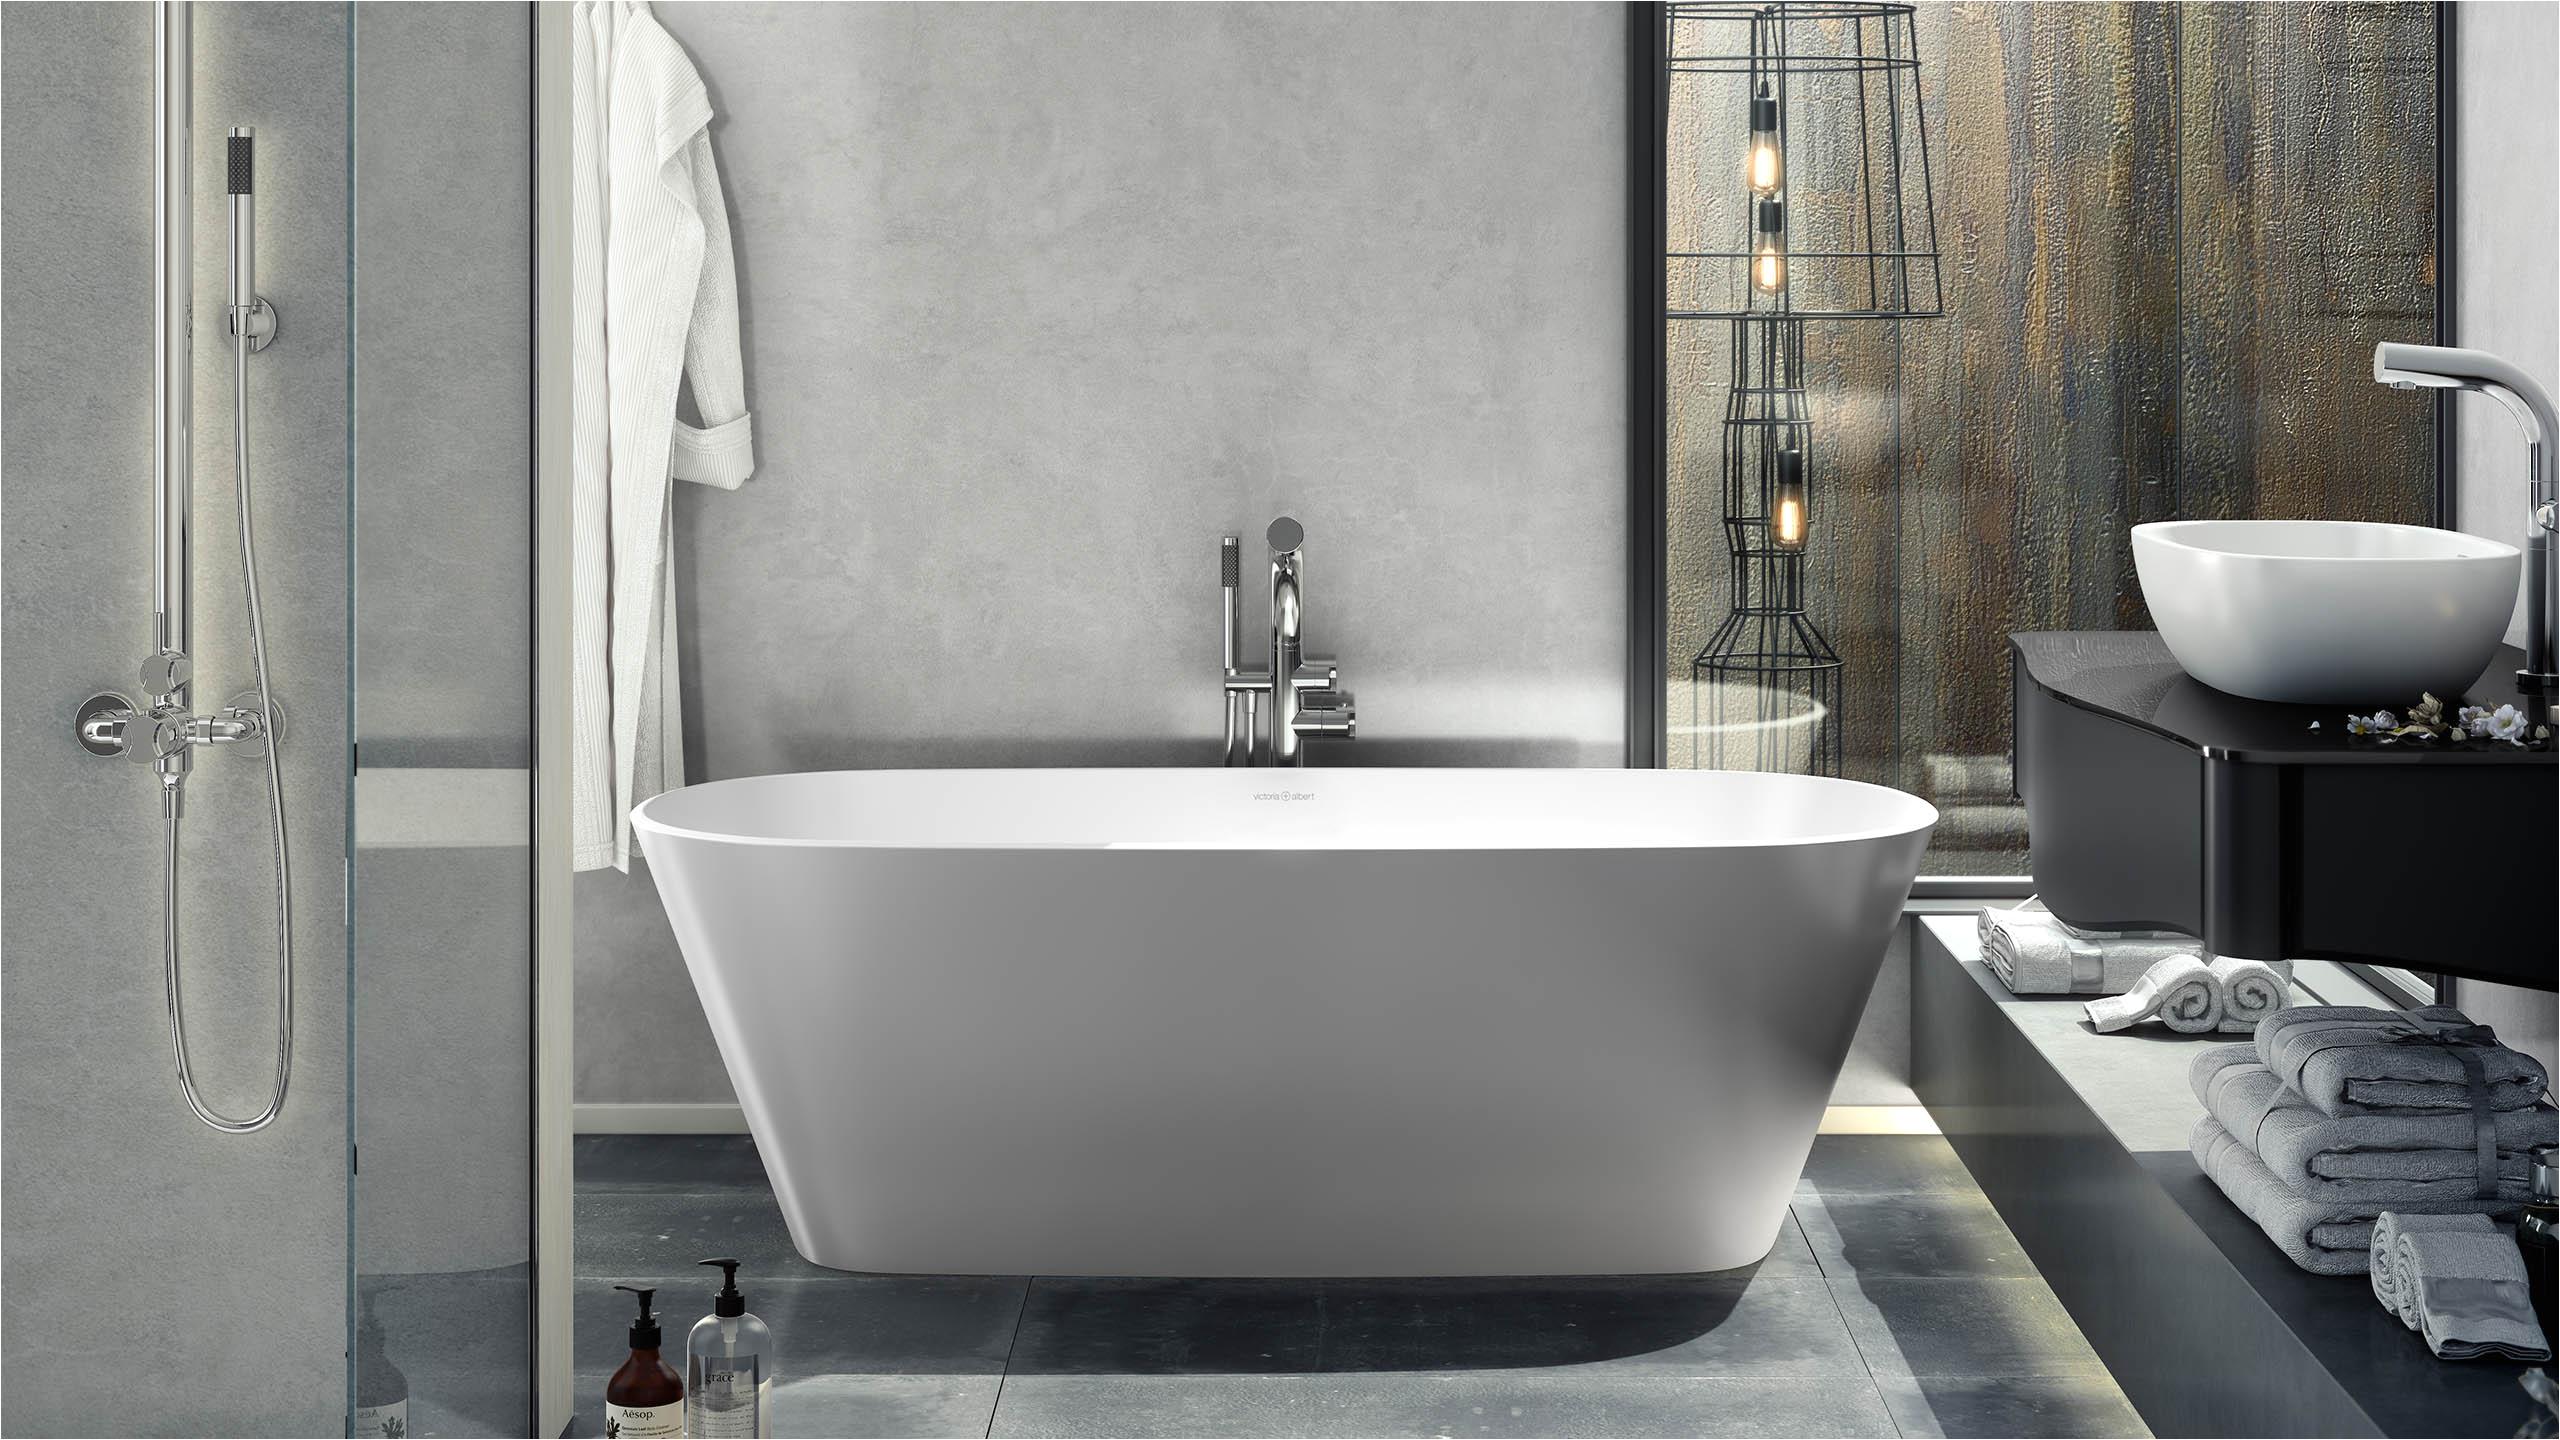 Freestanding Bathtub Usa Vetralla 2 Modern Freestanding Tub